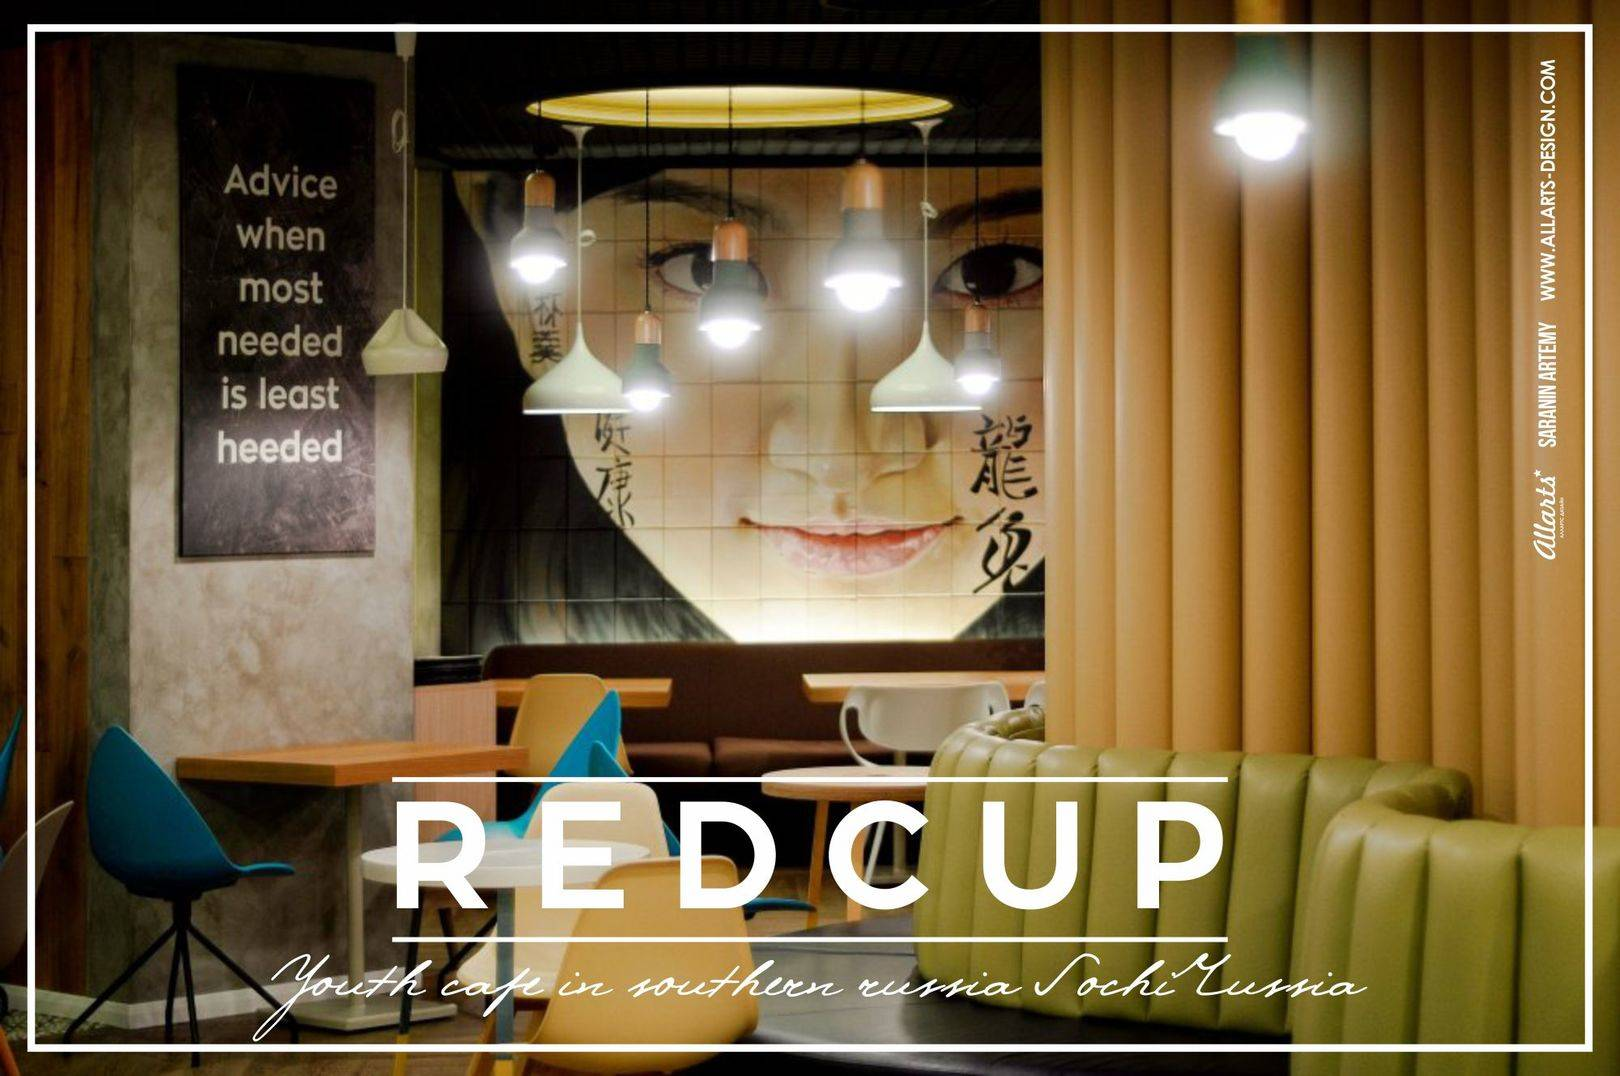 Дизайн интерьера кафе REDCUP